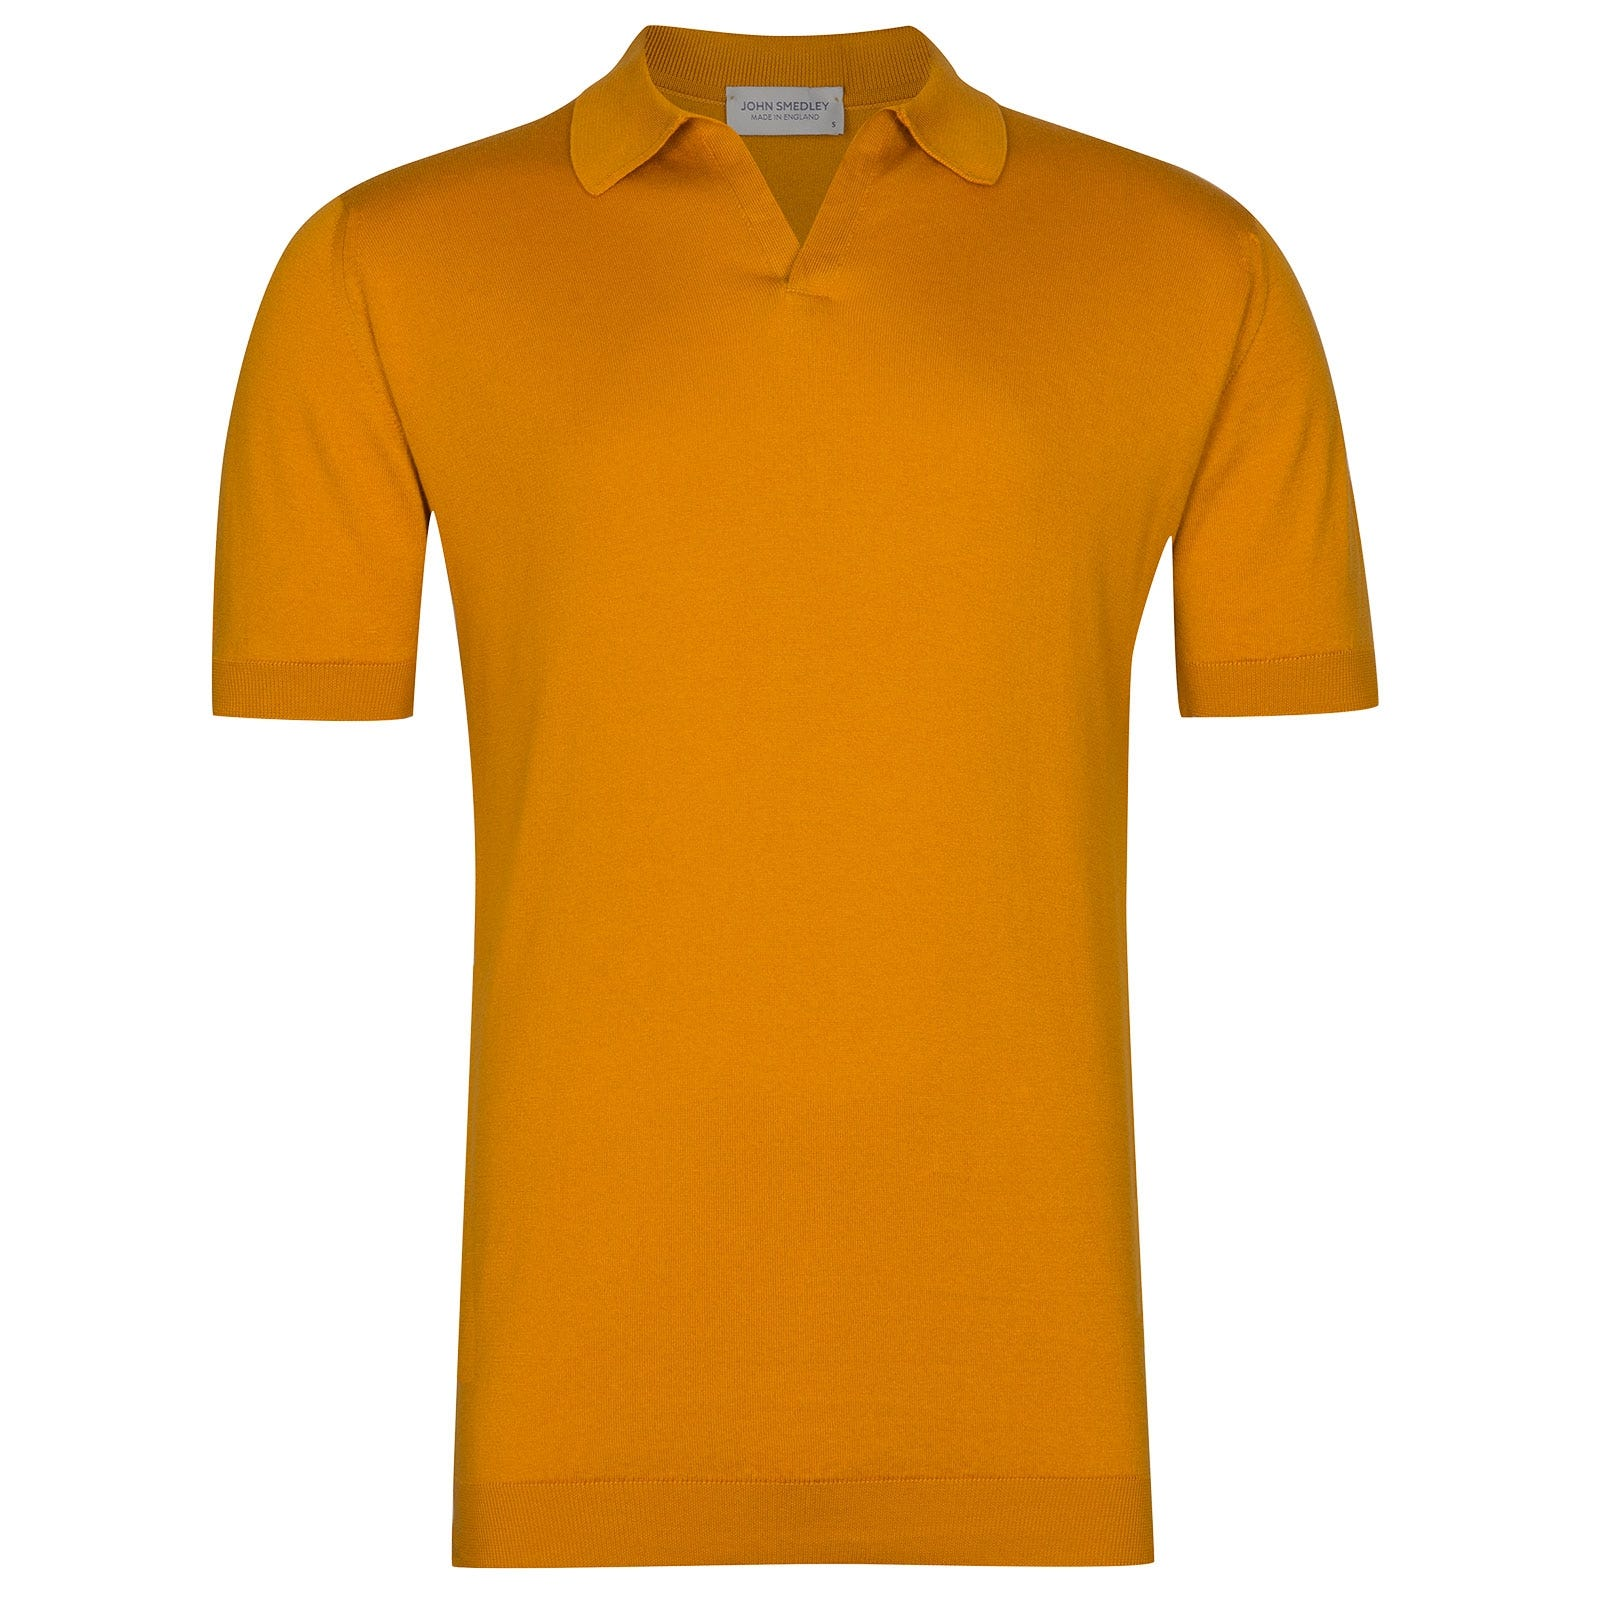 John Smedley Noah Sea Island Cotton Shirt in Topstitch Orange-XXL